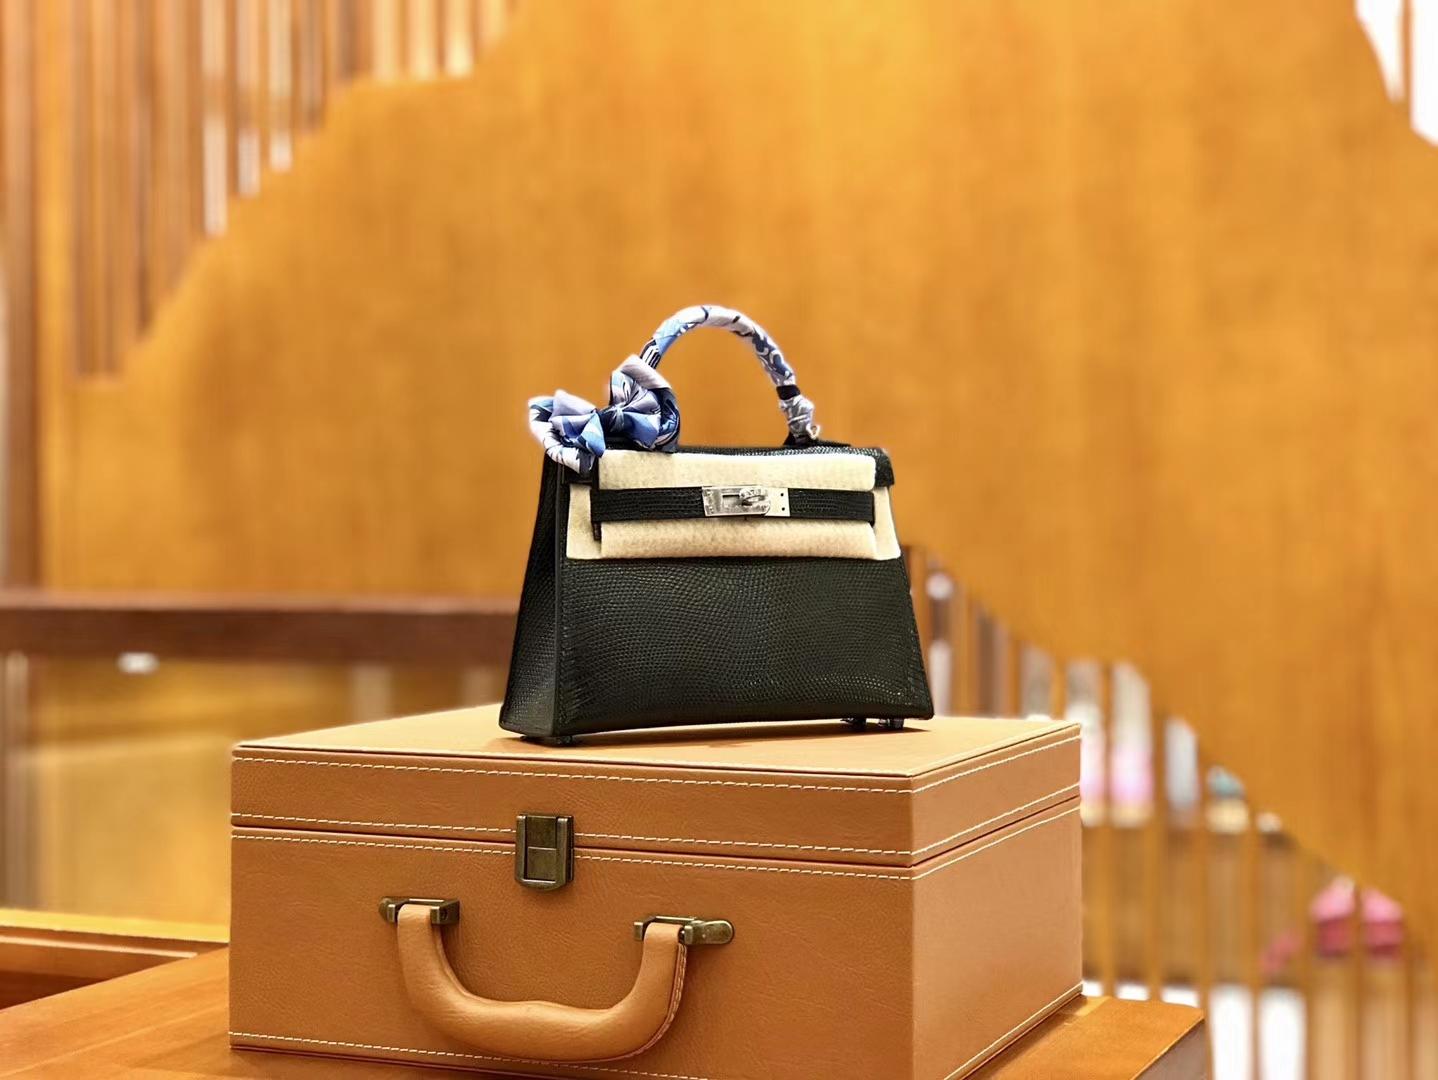 Hermès(爱马仕)新增现货 2代 19cm 蜥蜴皮 经典黑 银扣 全手工缝制